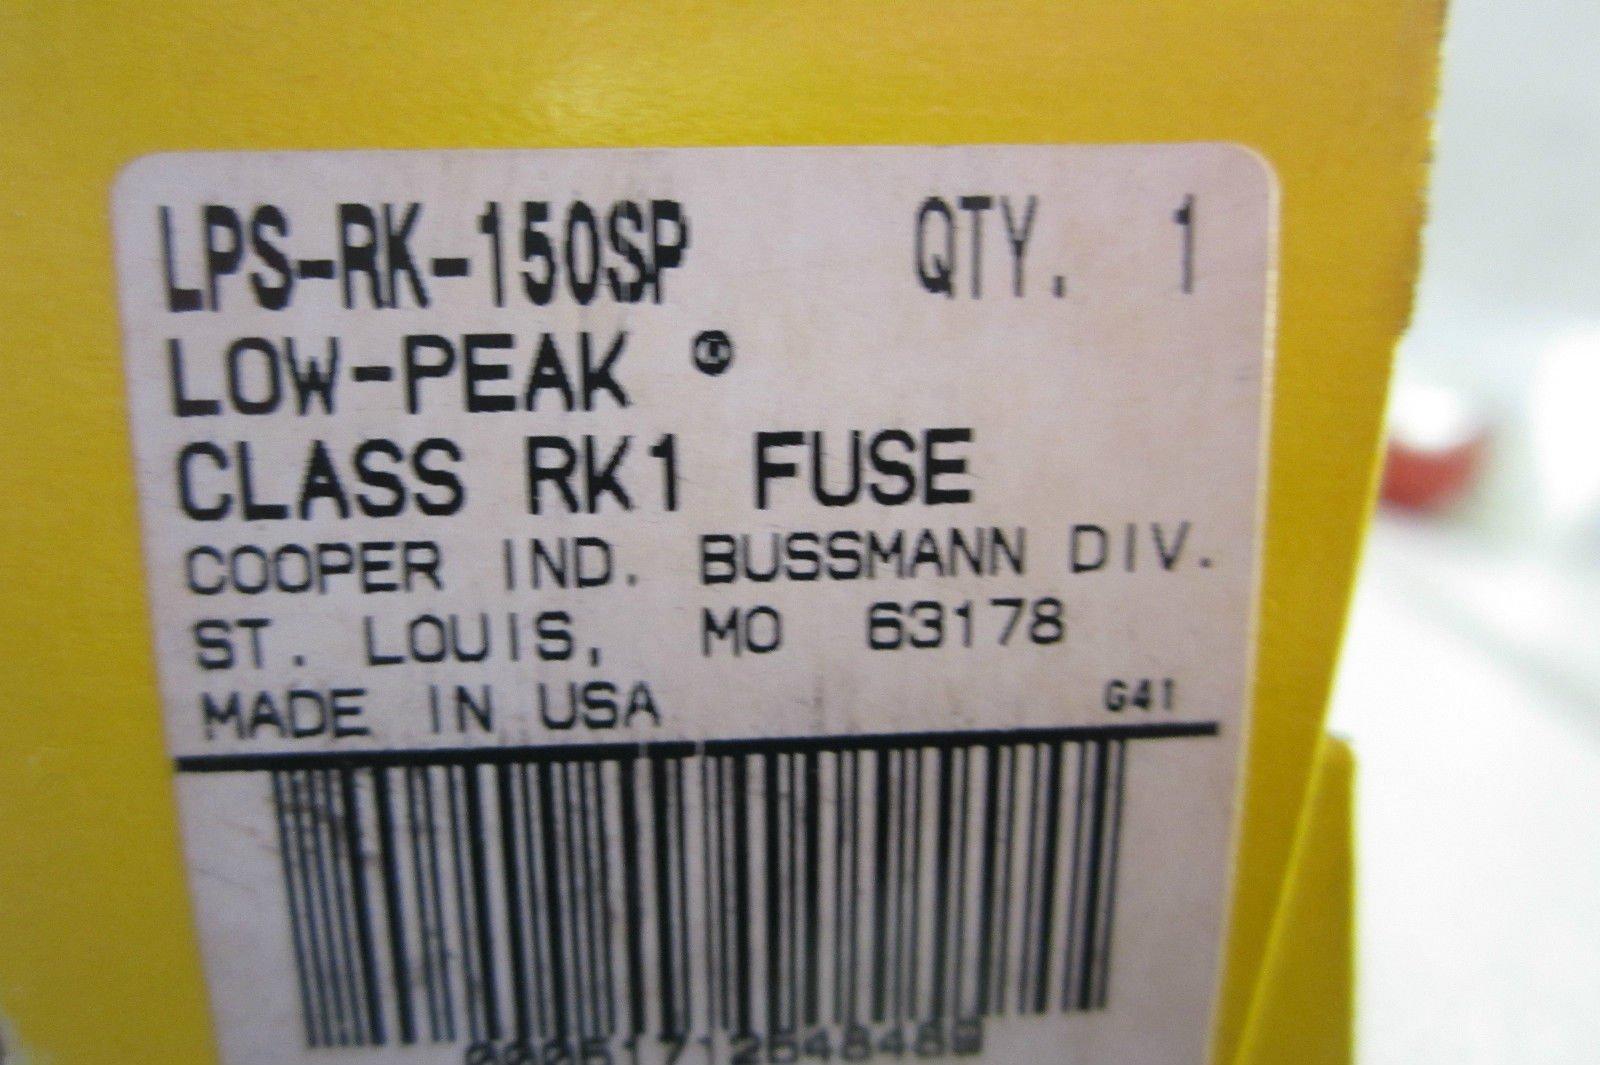 NEW BUSSMANN LPS-RK-150SP FUSE LPSRK150SP